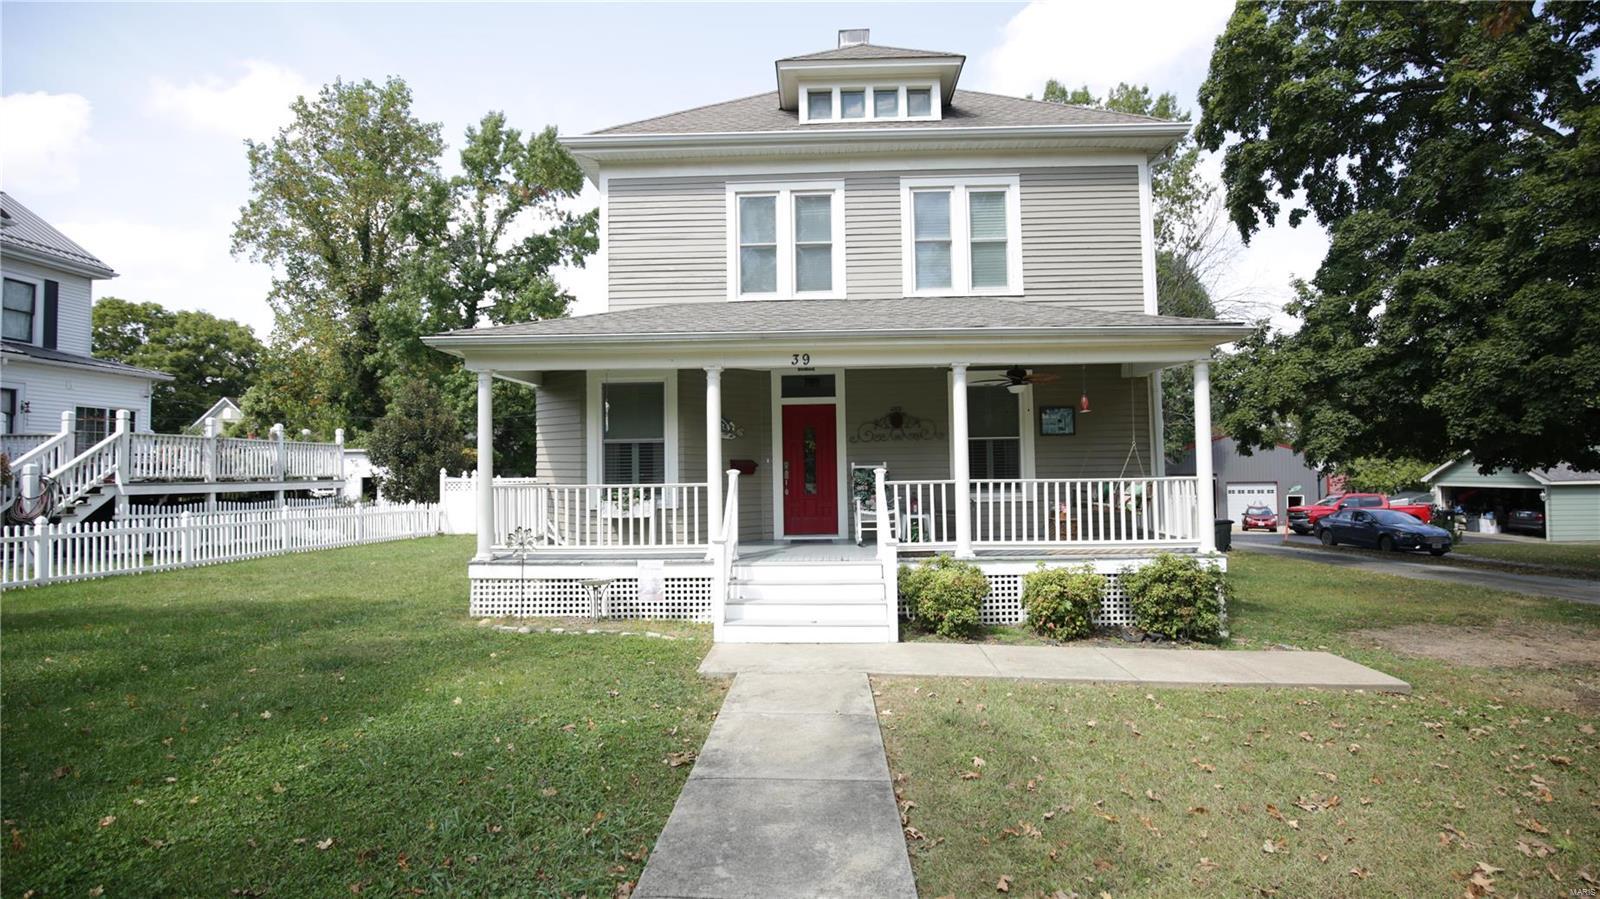 39 SW Main Property Photo - Bonne Terre, MO real estate listing